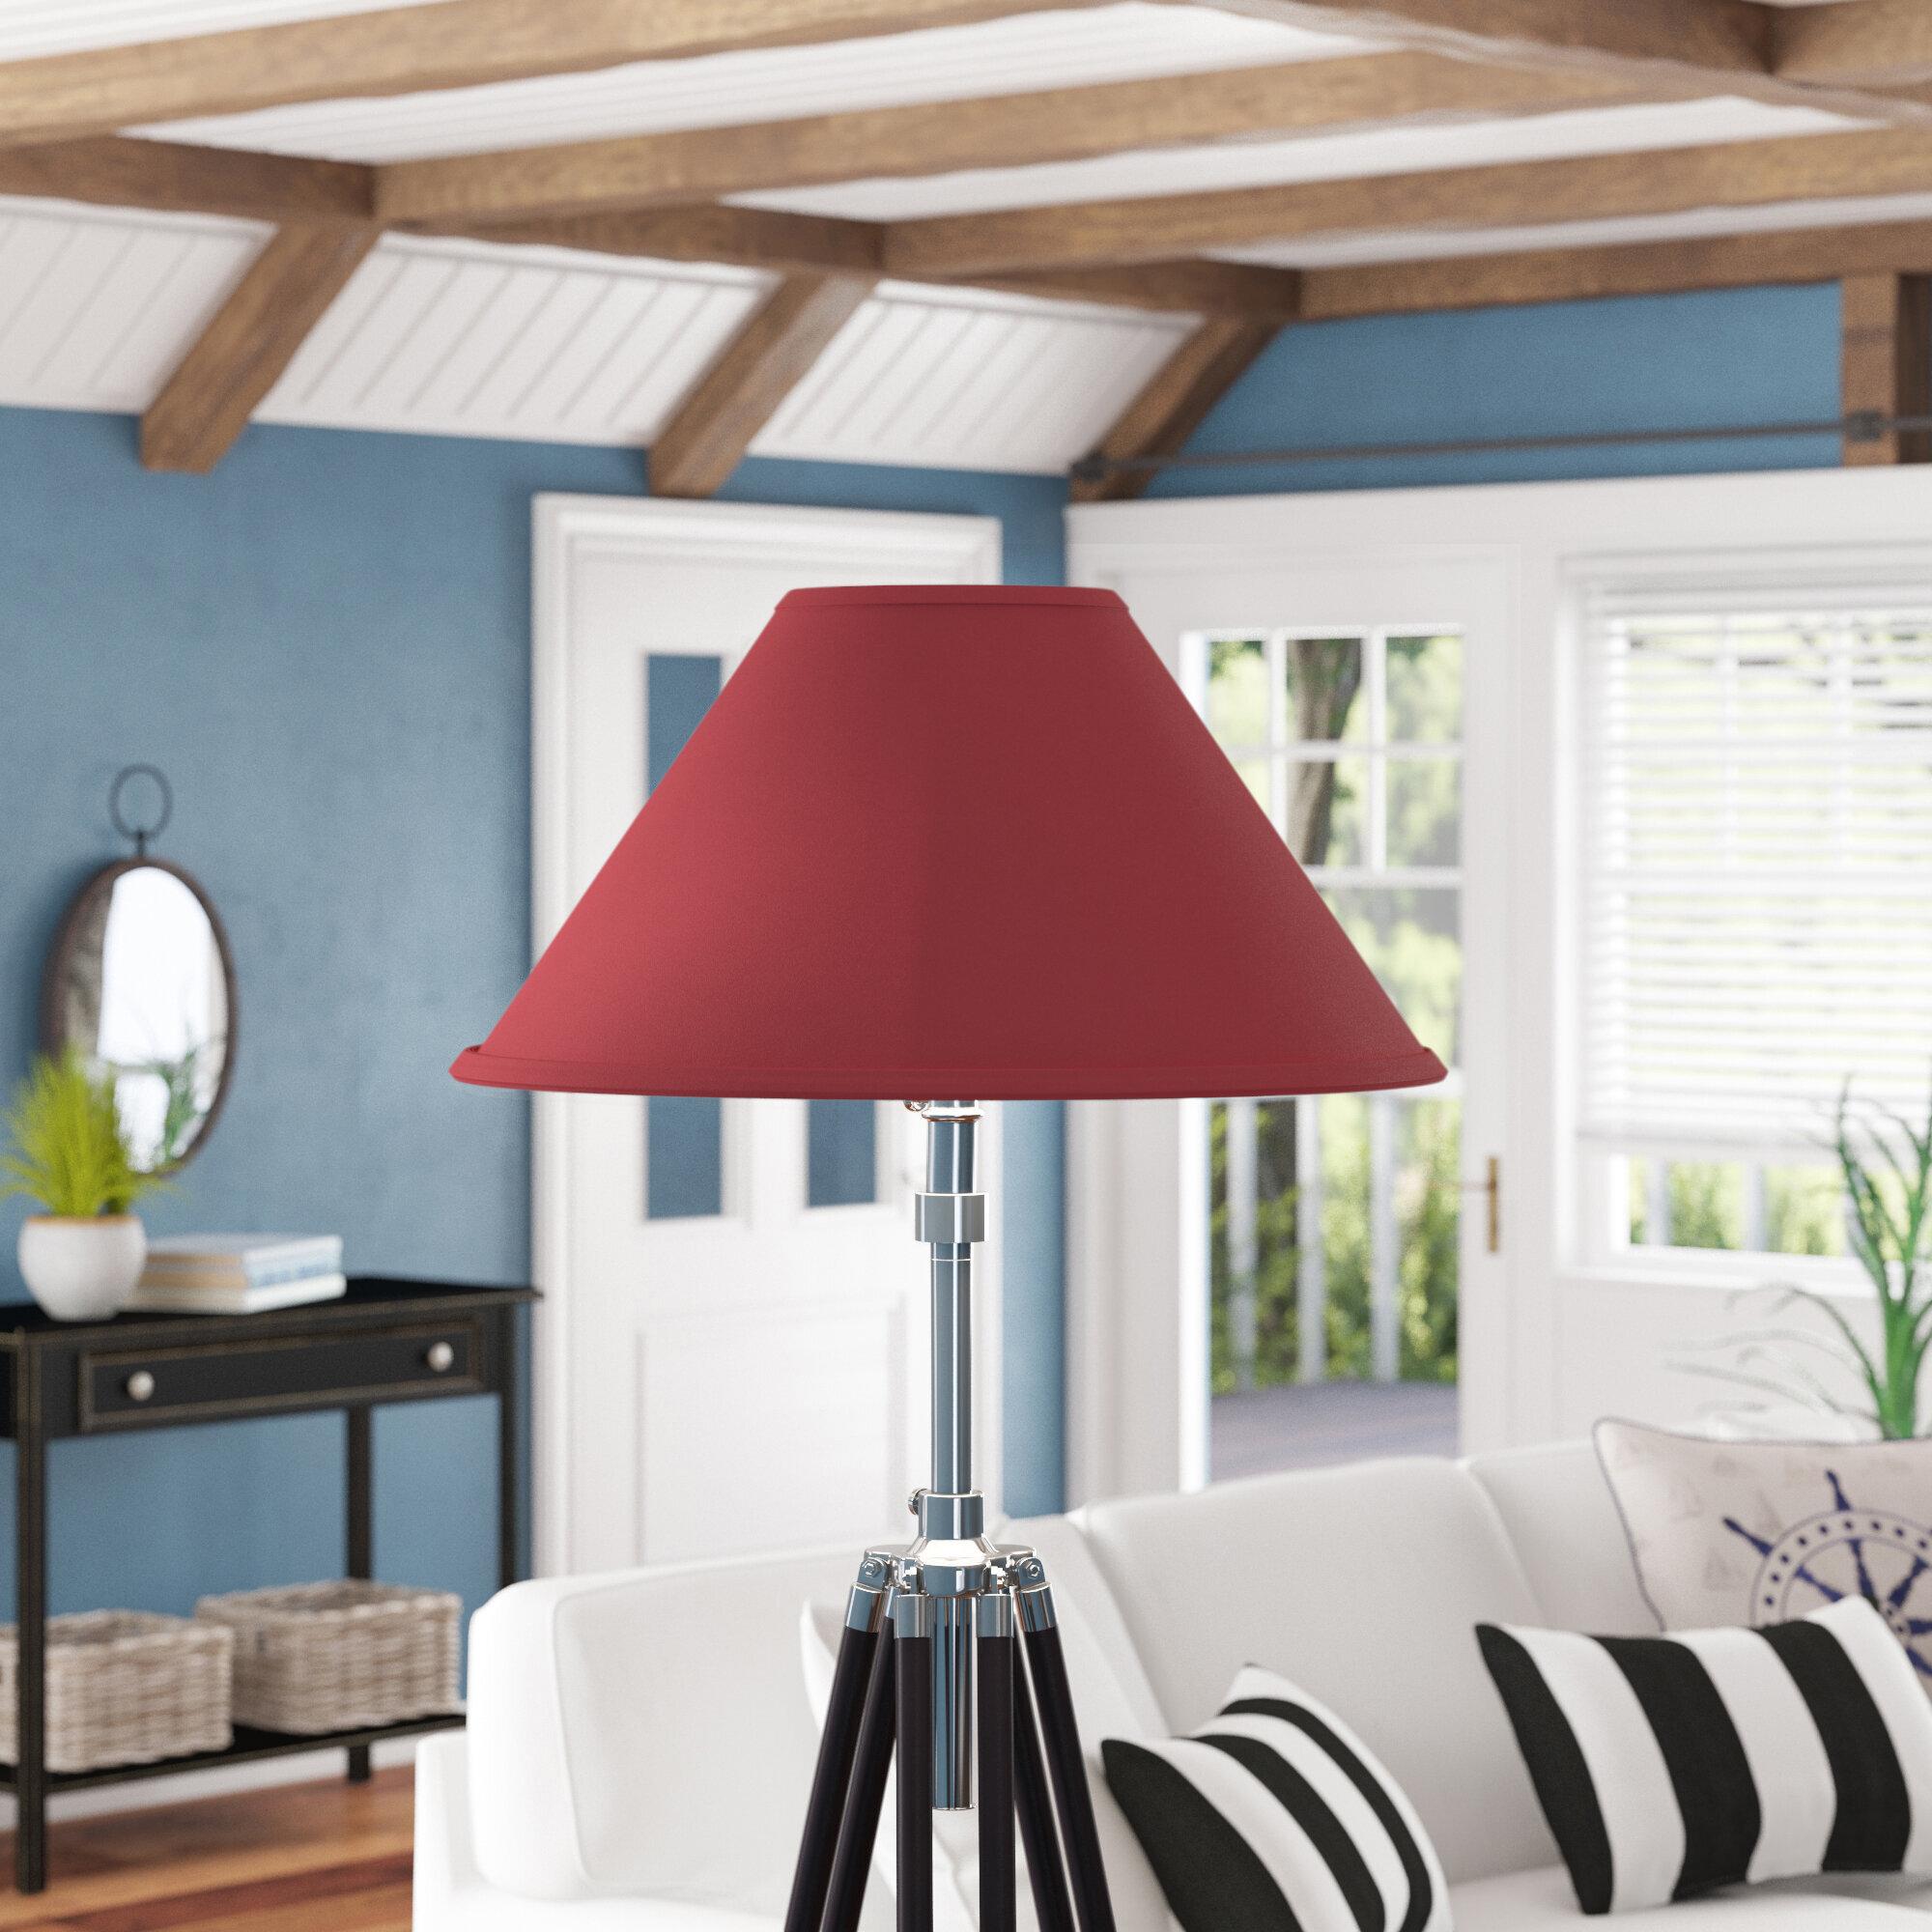 Breakwater Bay 10 5 H X 22 W Empire Lamp Shade Spider Attachment Reviews Wayfair